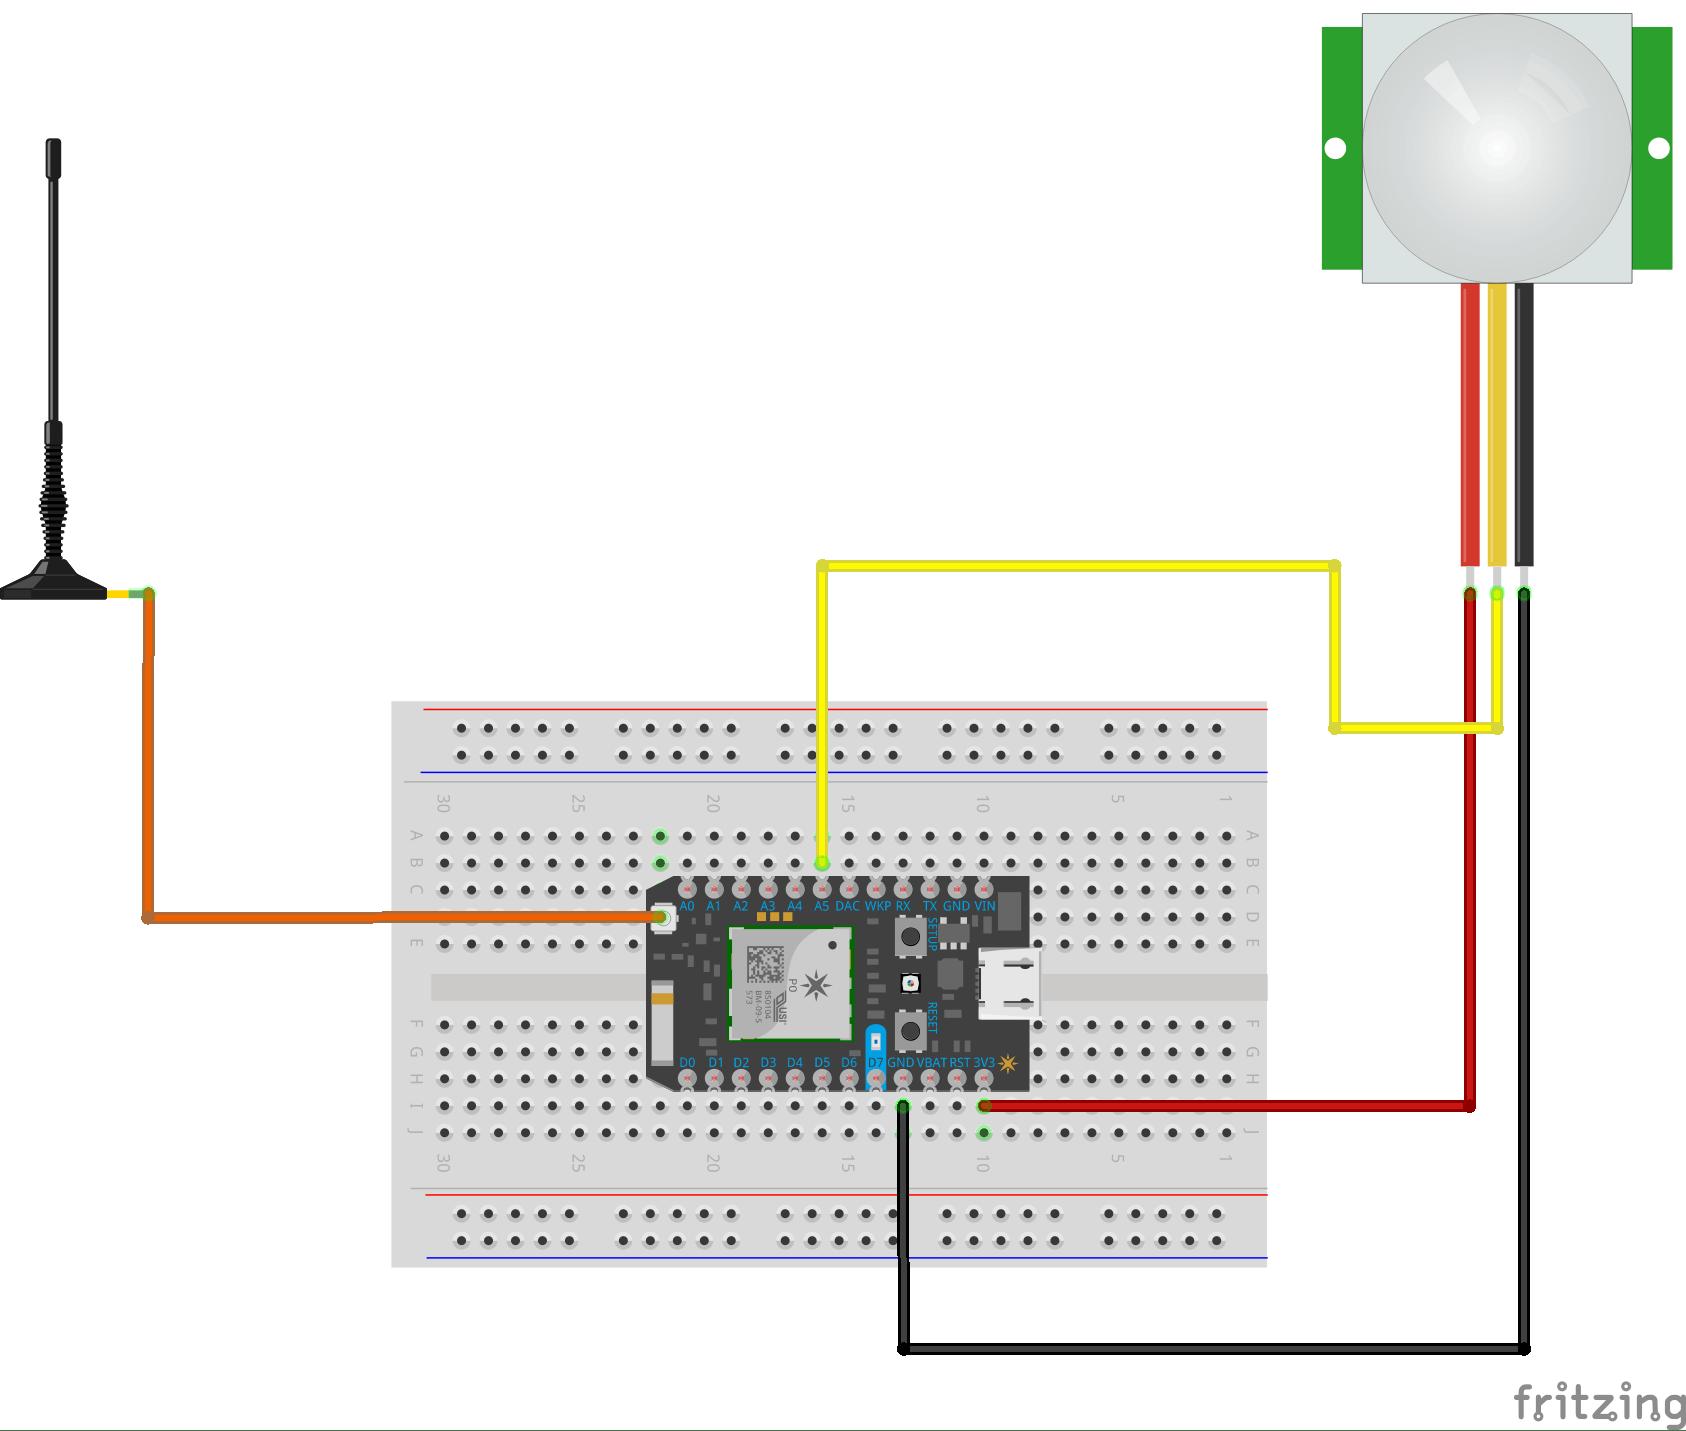 Duck Antenna, Particle Photon,and PIR sensor